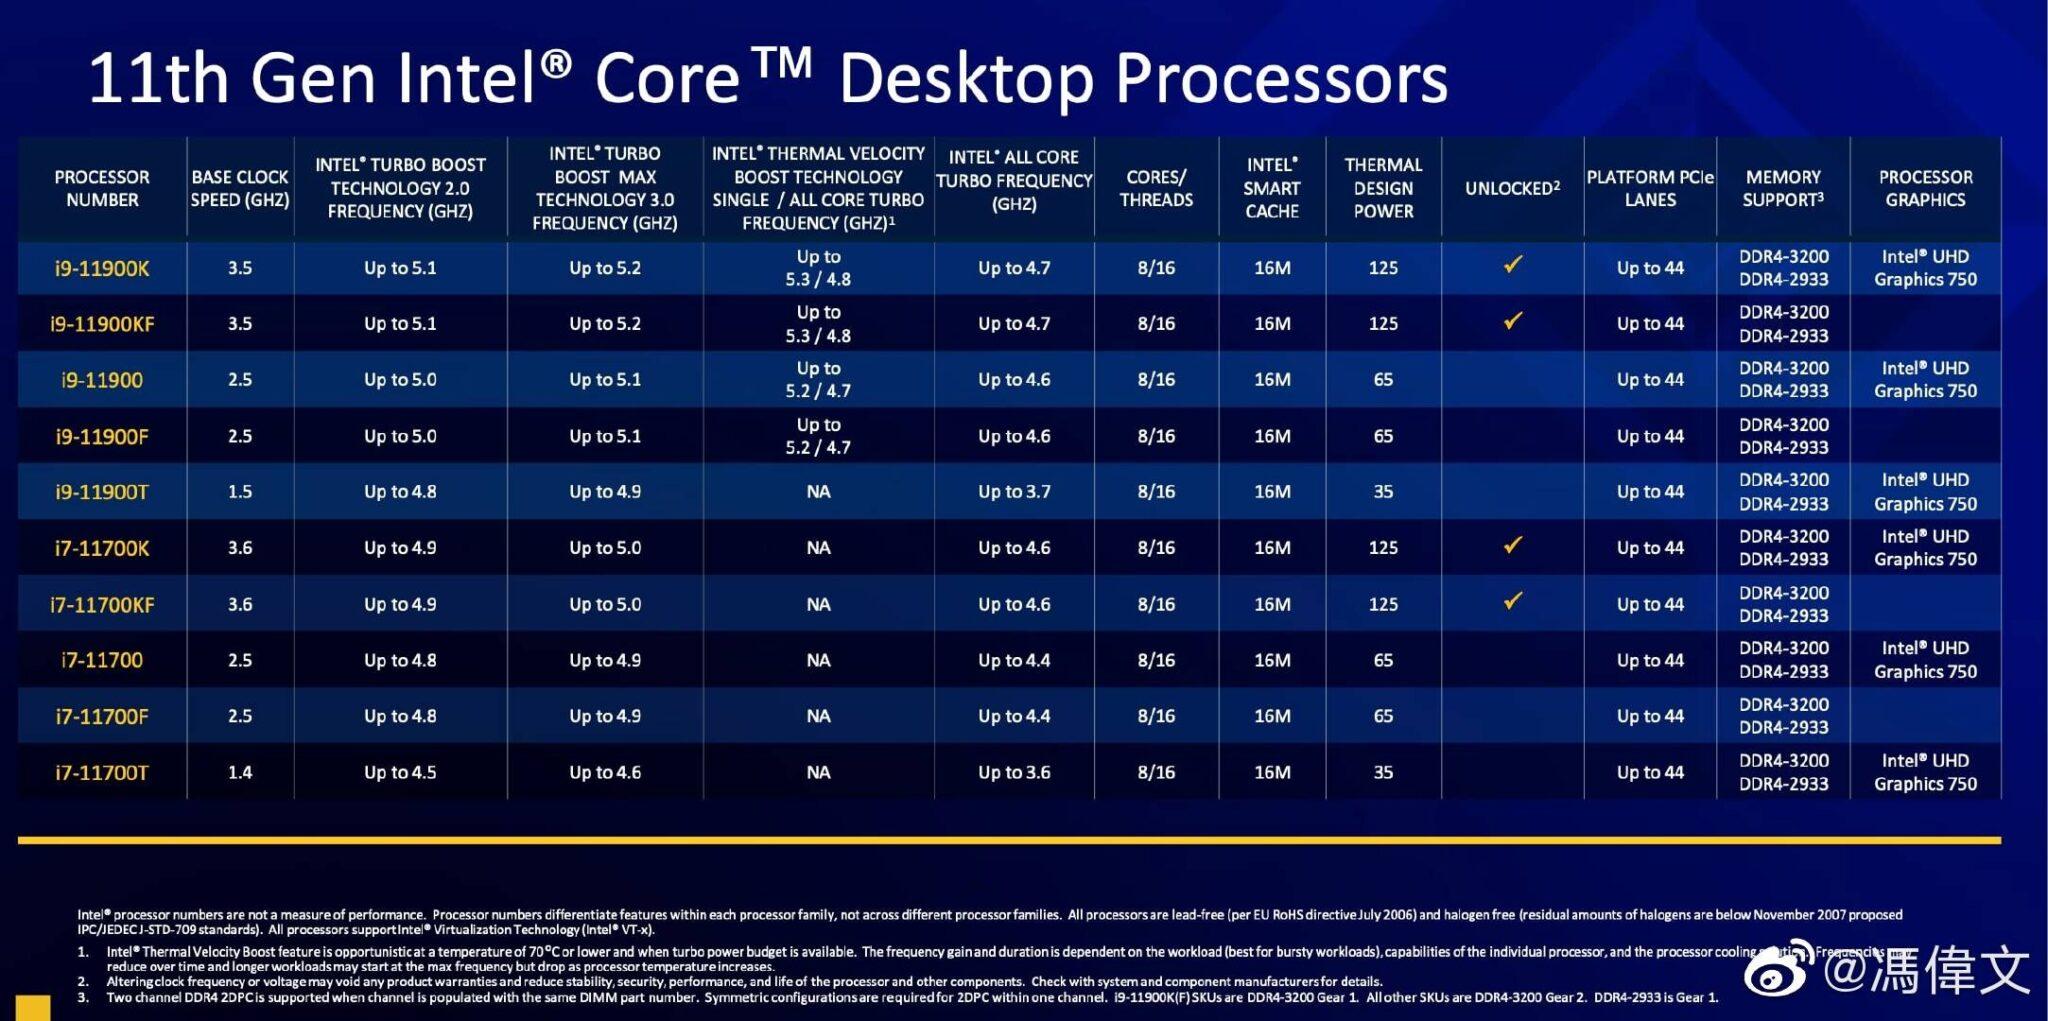 ظهور التفاصيل حول معالجات Core i9 وi7 ضمن Rocket Lake-S